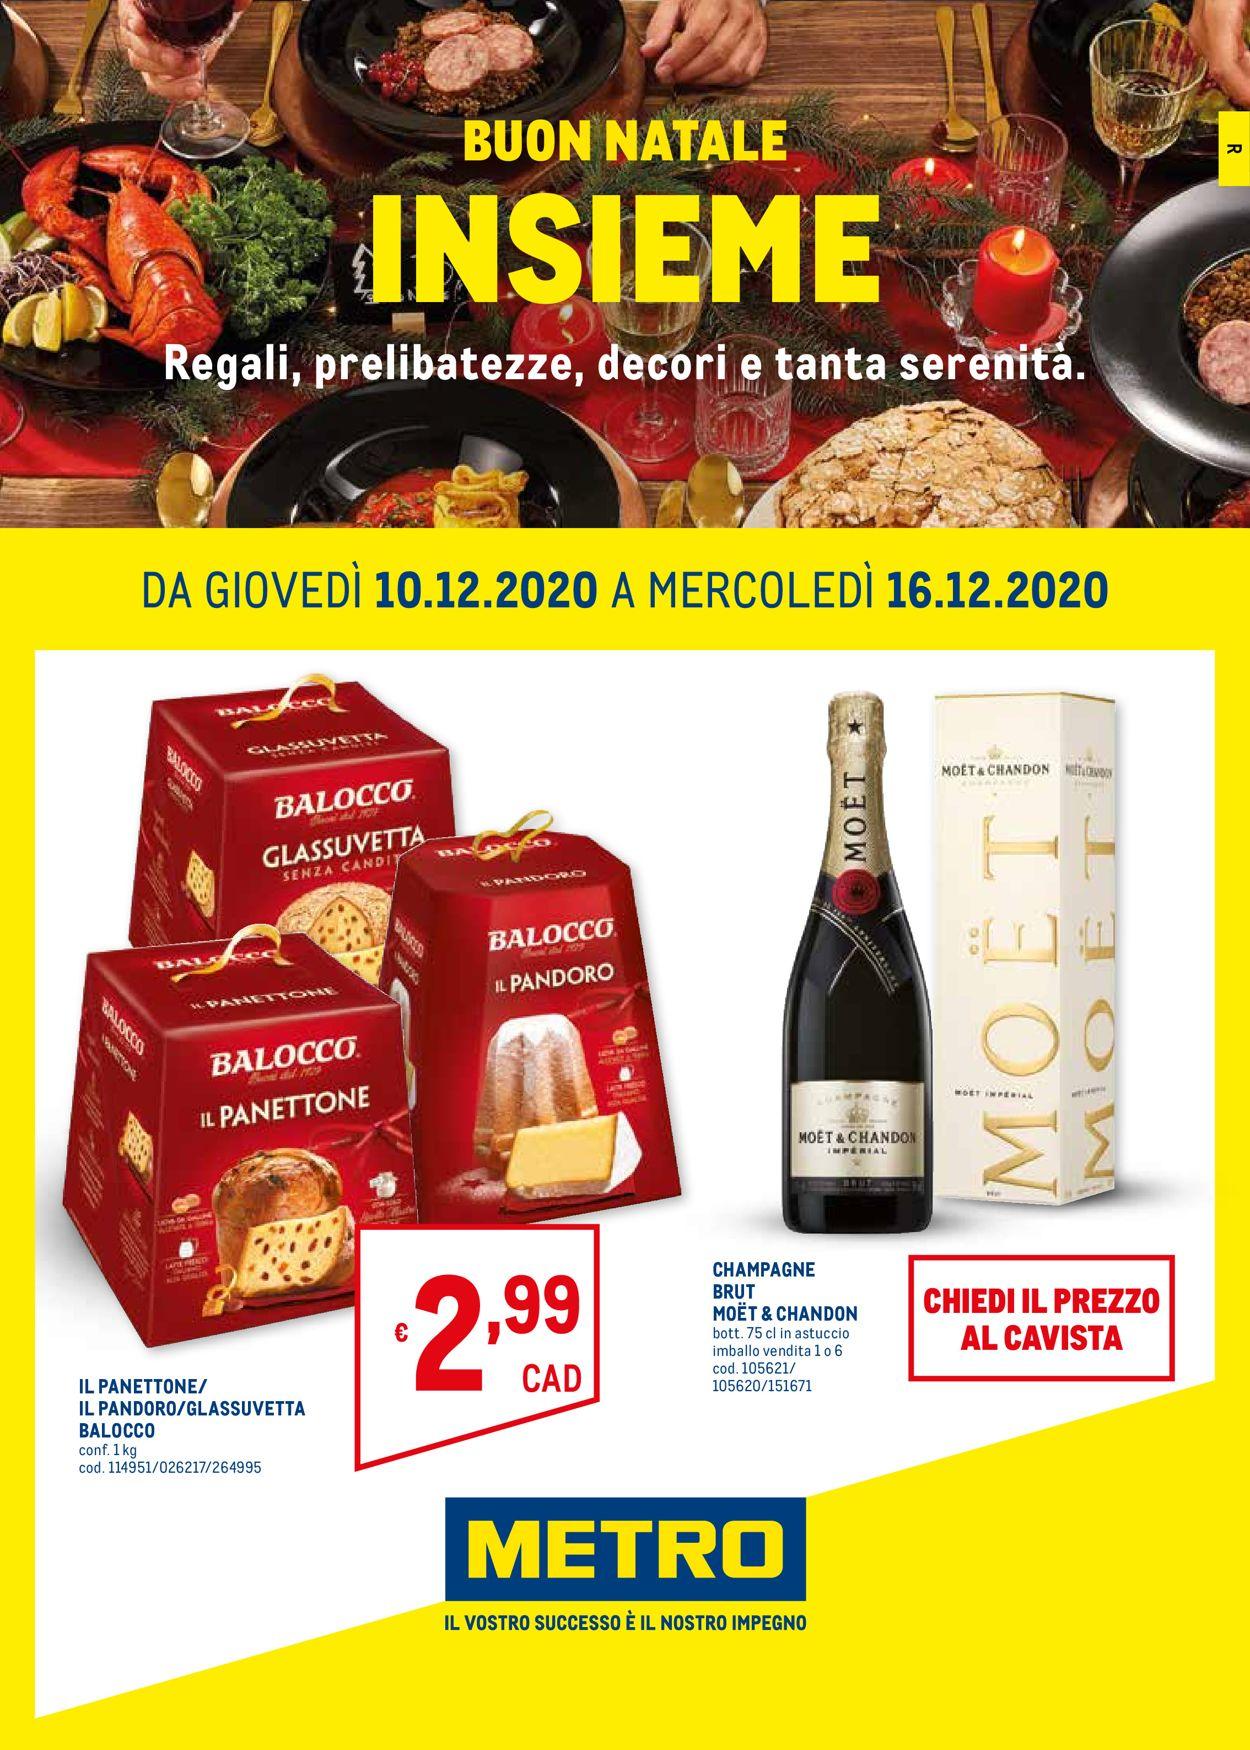 Volantino Metro - Natale 2020 - Offerte 10/12-16/12/2020